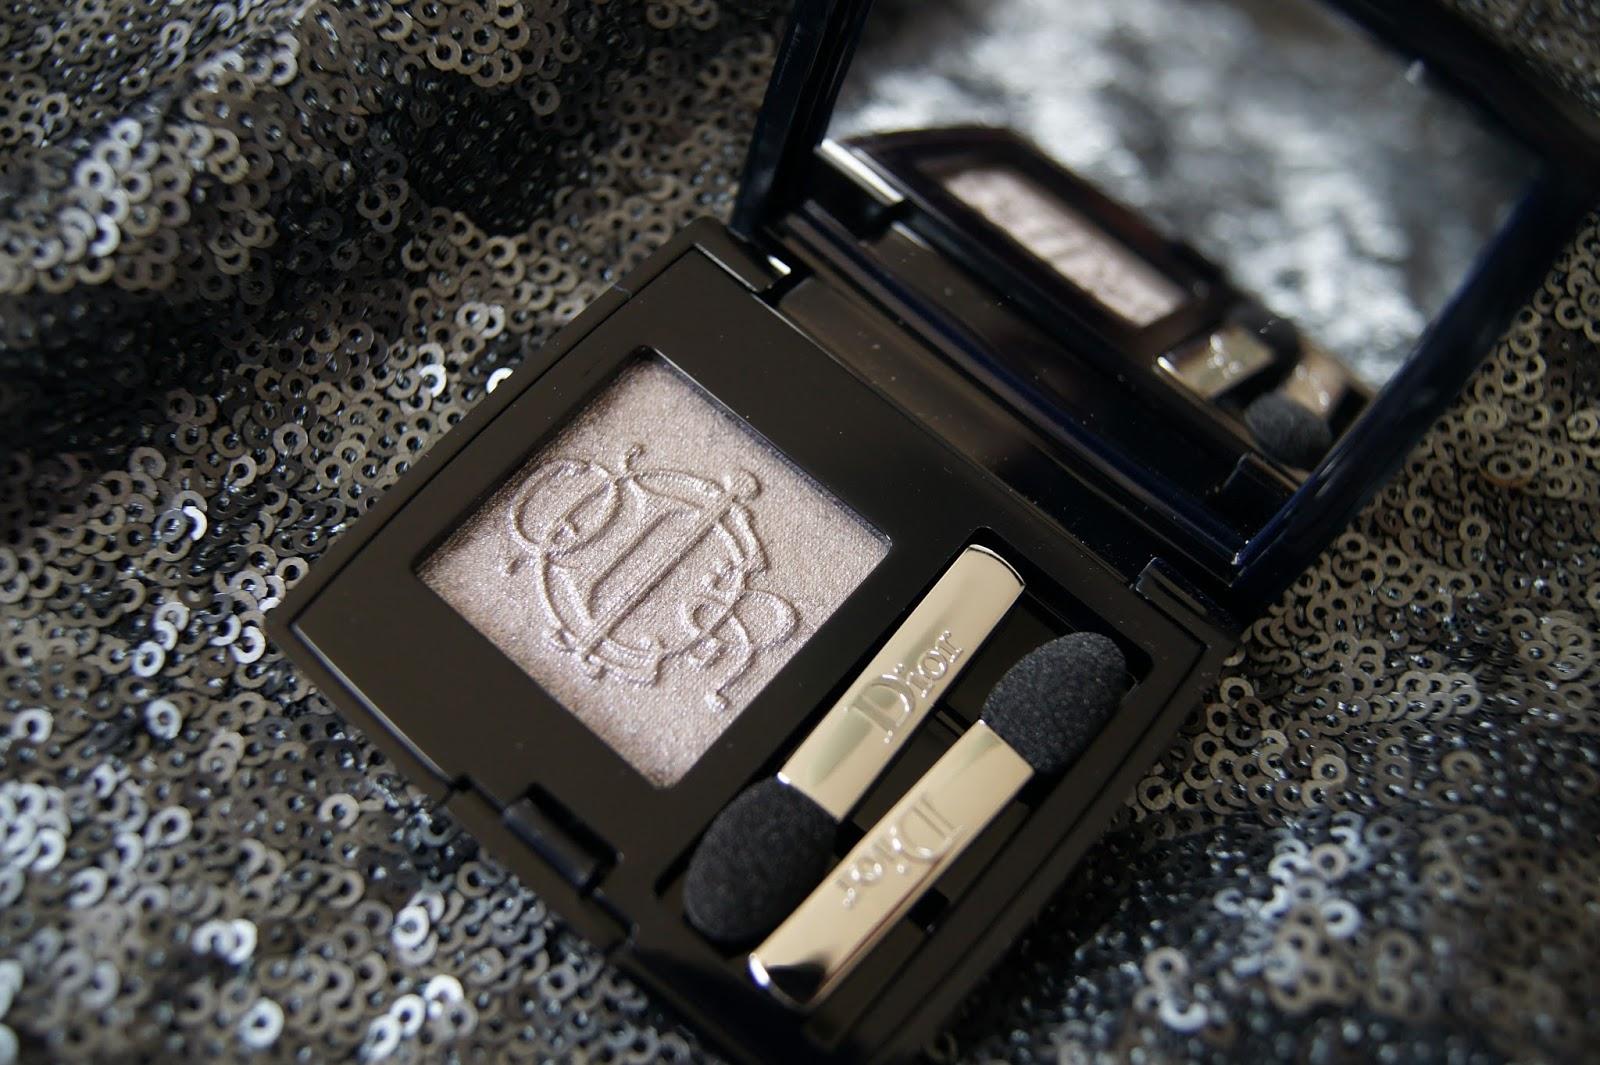 Dior Kingdom of Colors Spring 2015-Fairy Gray mono eyeshadow